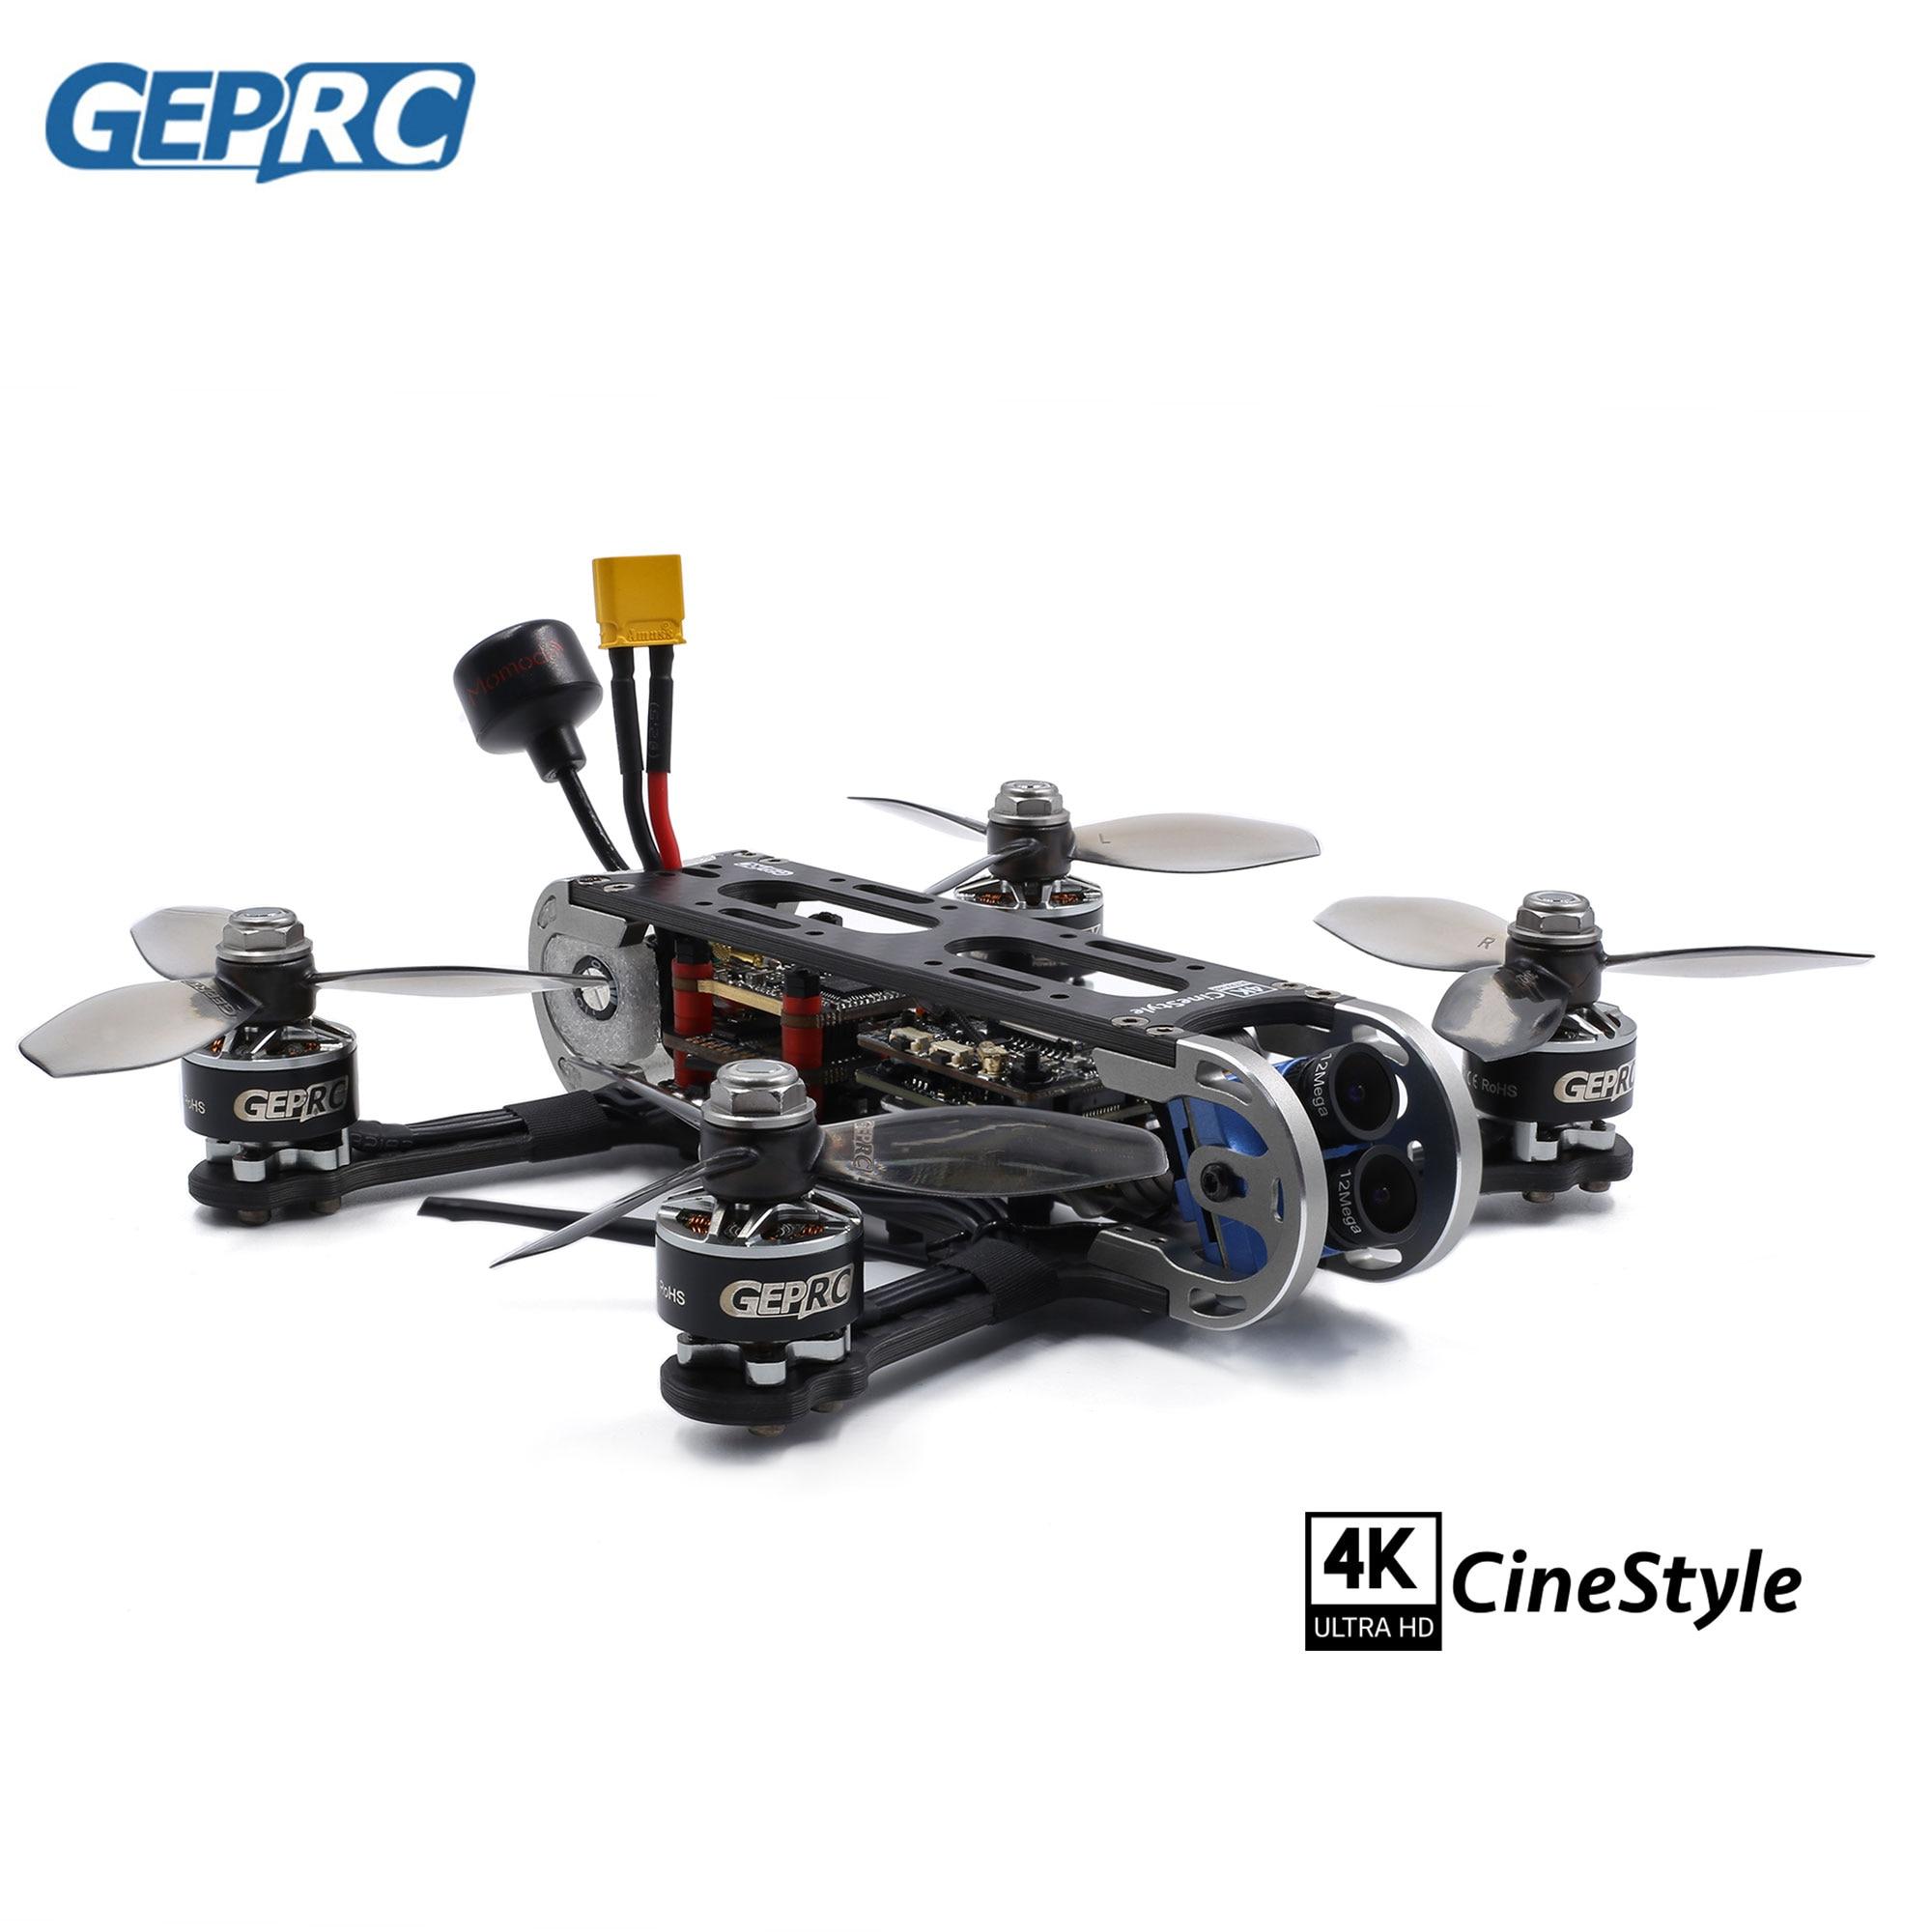 GEPRC CineStyle 4K 144mm F7 Dual Gyro Flight Controller 35A ESC 1507 3600KV Brushless Motor DIY FPV Racing Drone